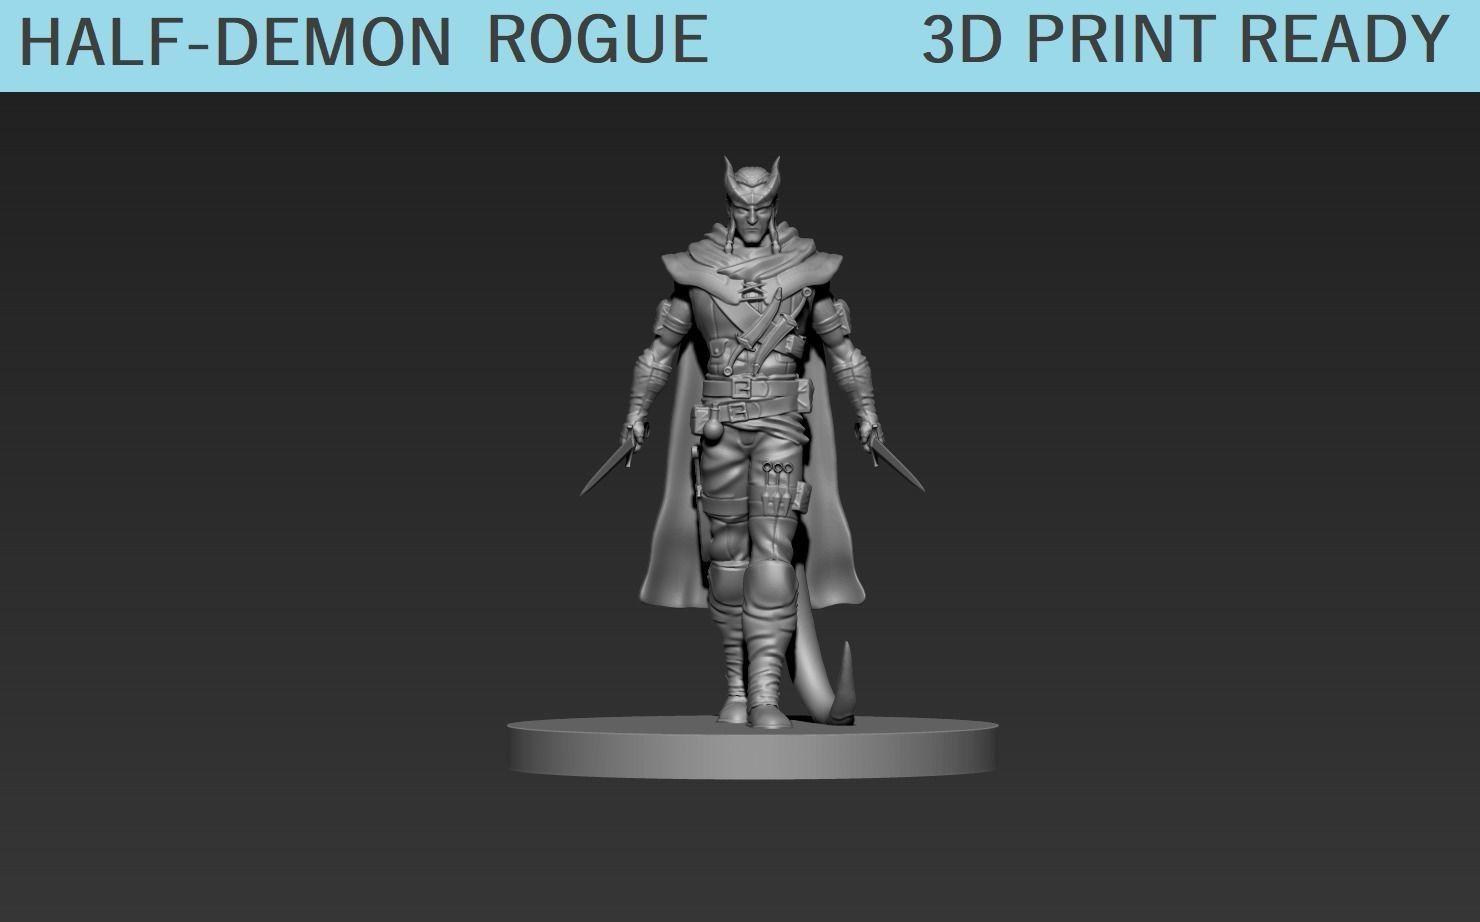 Half-Demon Rogue Miniature